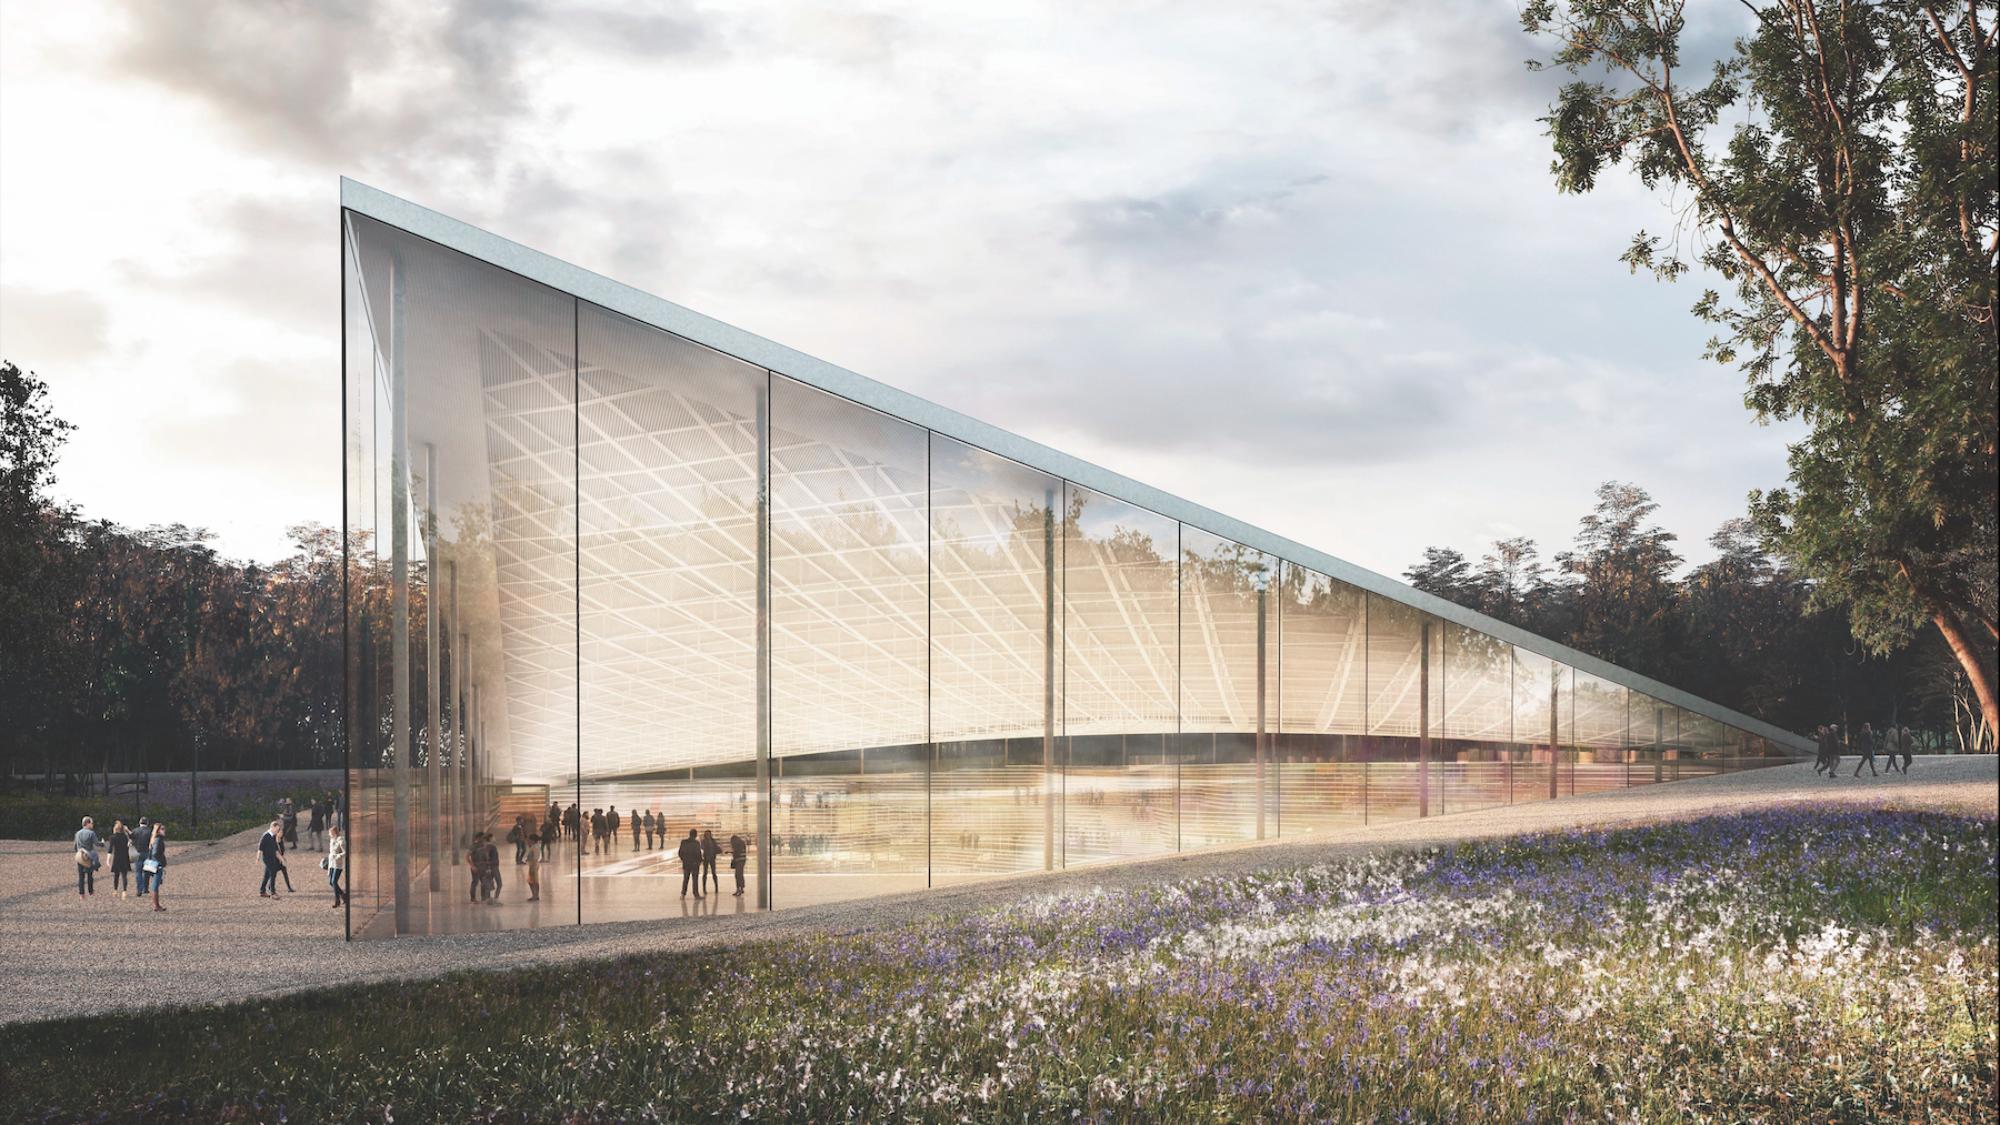 Design for the Babyn Yar Memorial Center. Credit: BYHMC/Querkraft.